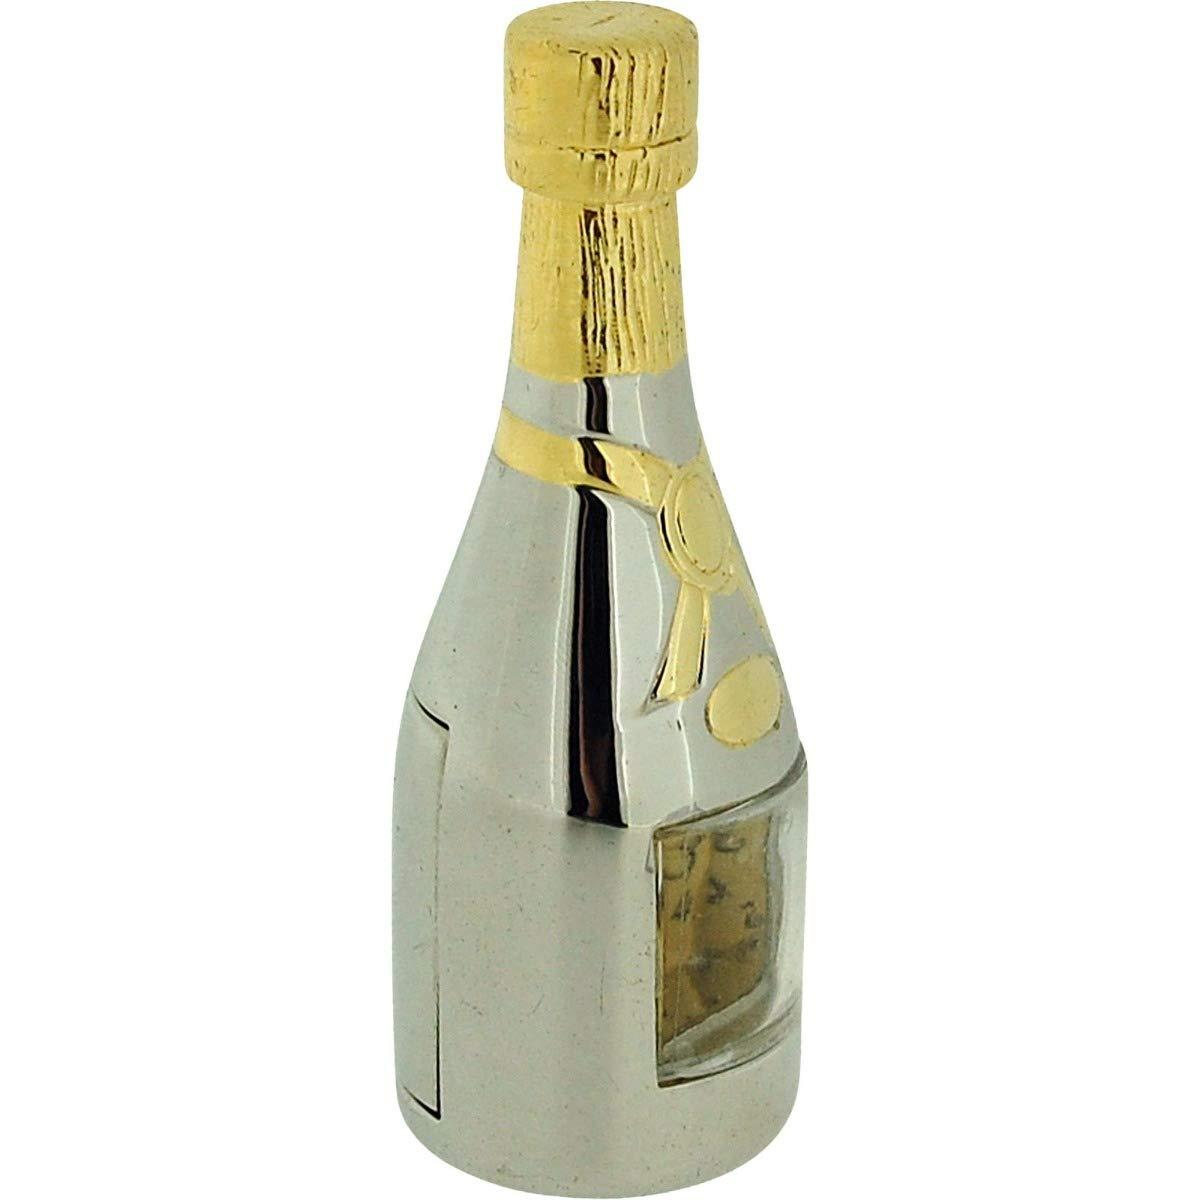 GTP Miniature Chrome /& Goldtone Champagne Bottle Novelty Collectors Clock IMP1031